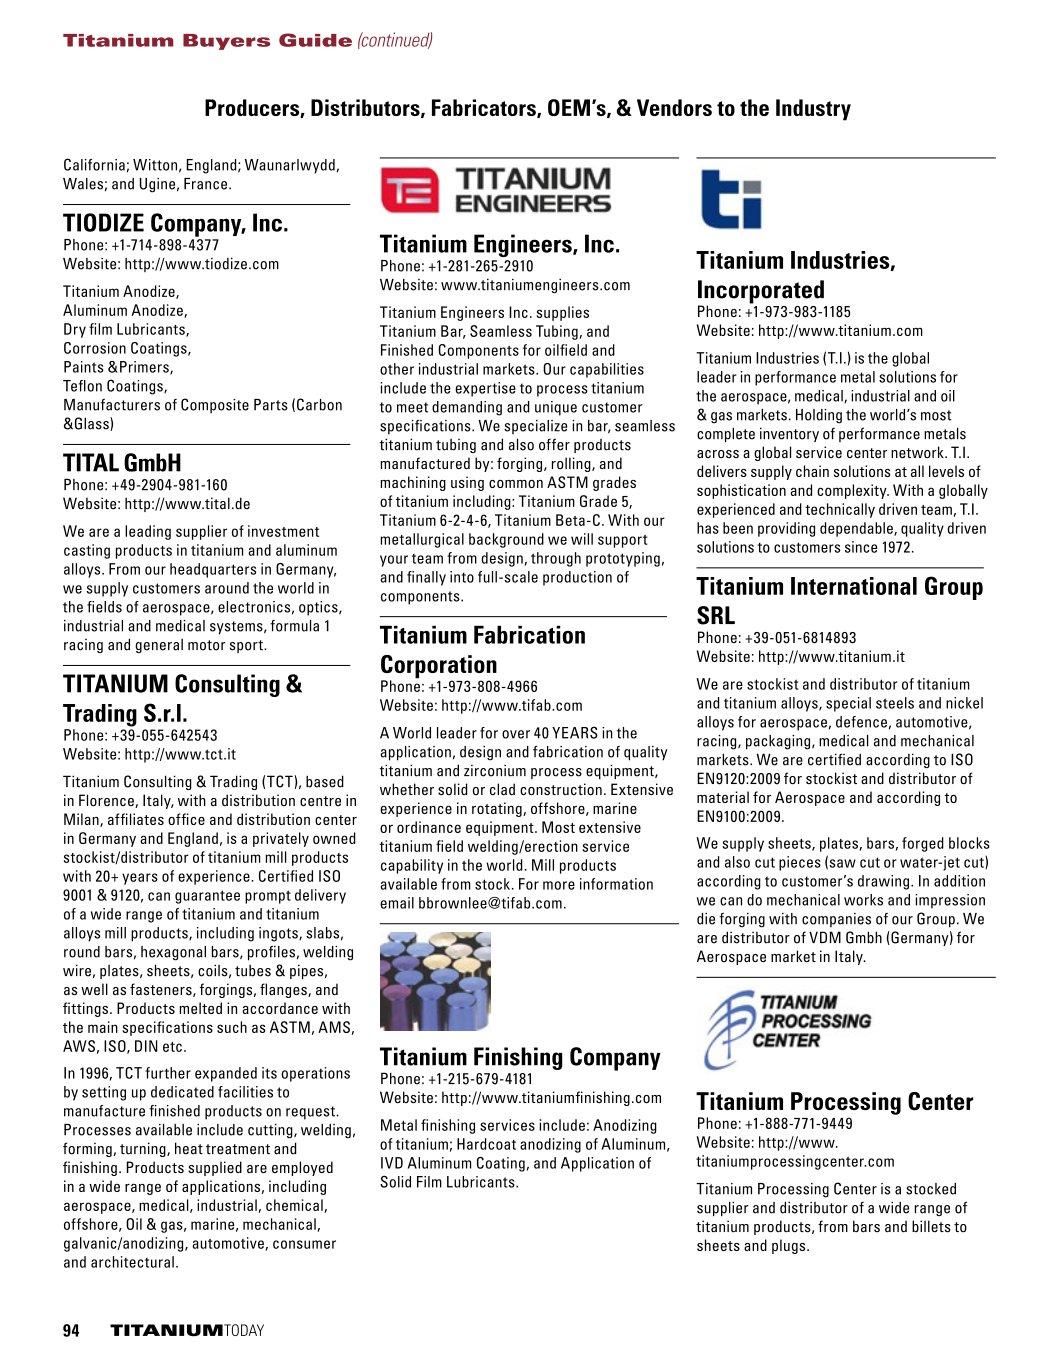 Titanium Today Industrial Edition V2